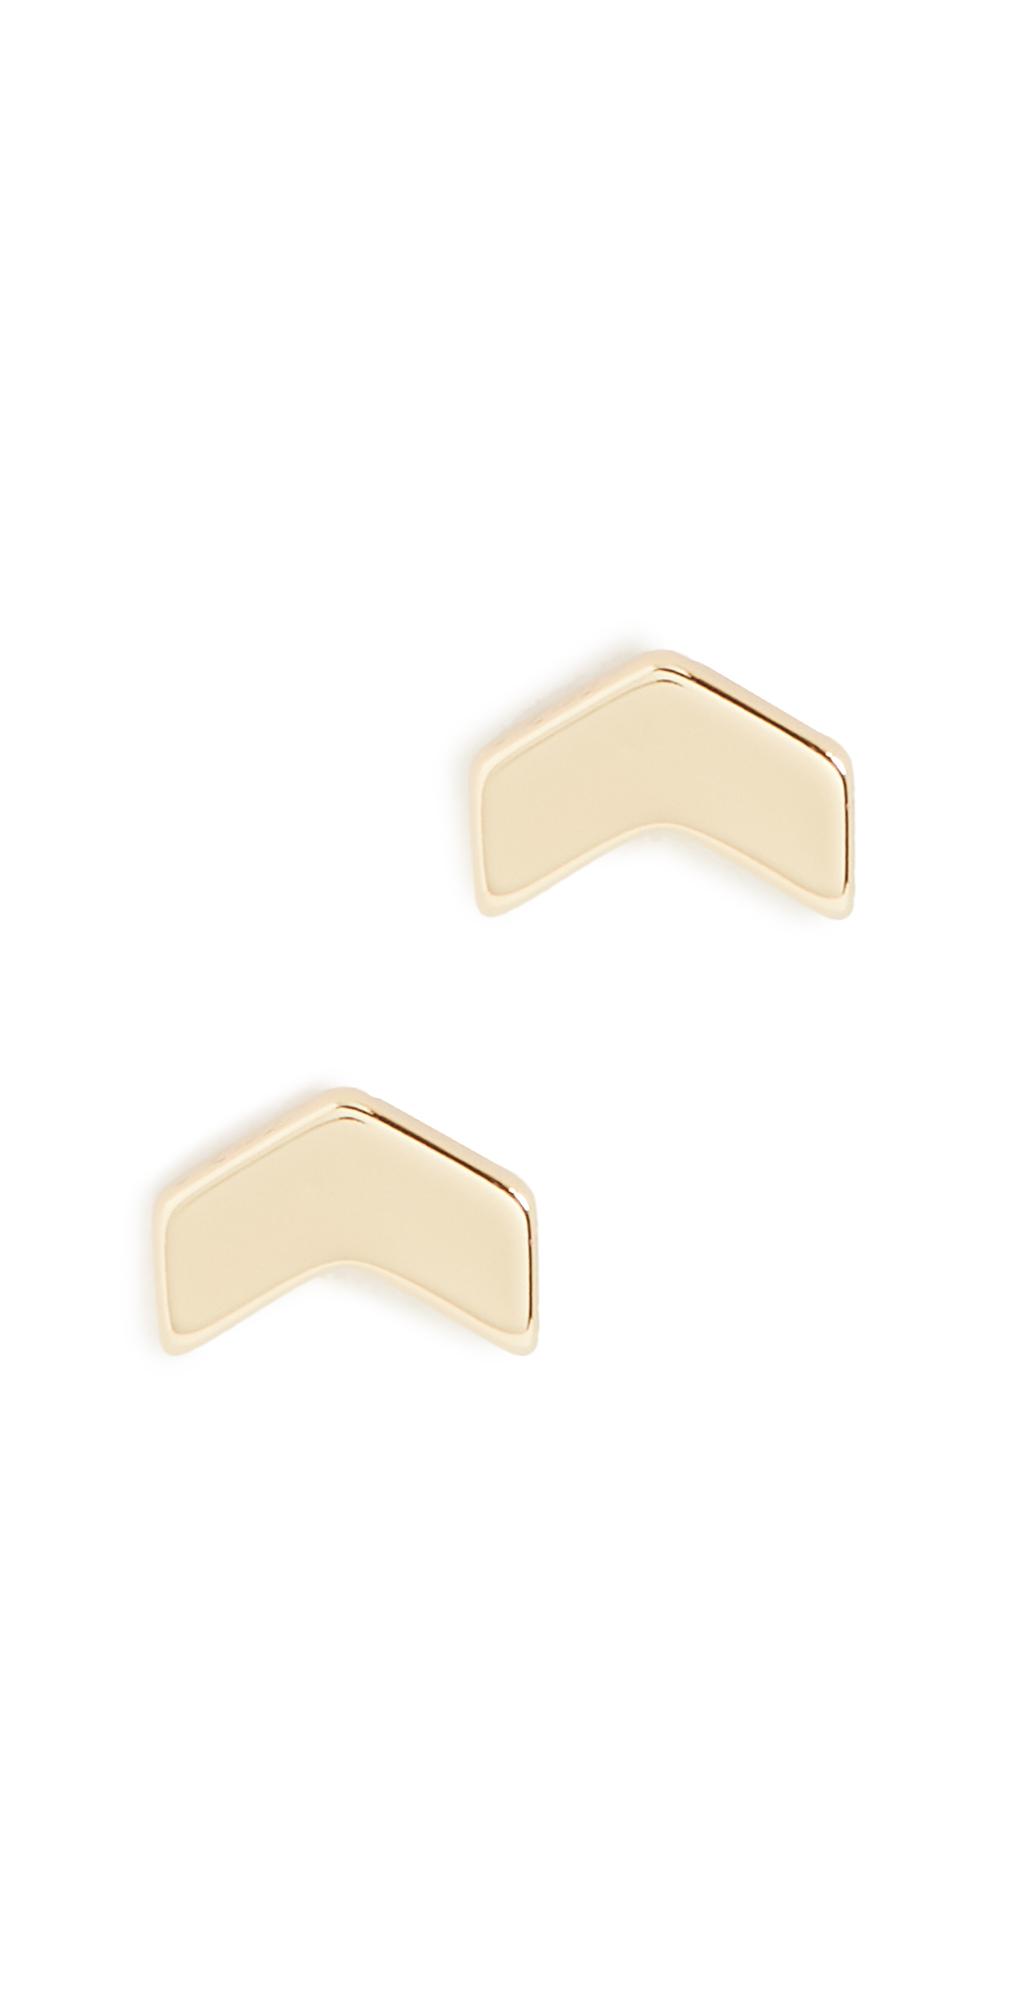 Gorjana Earrings VENICE CHEVRON STUD EARRINGS